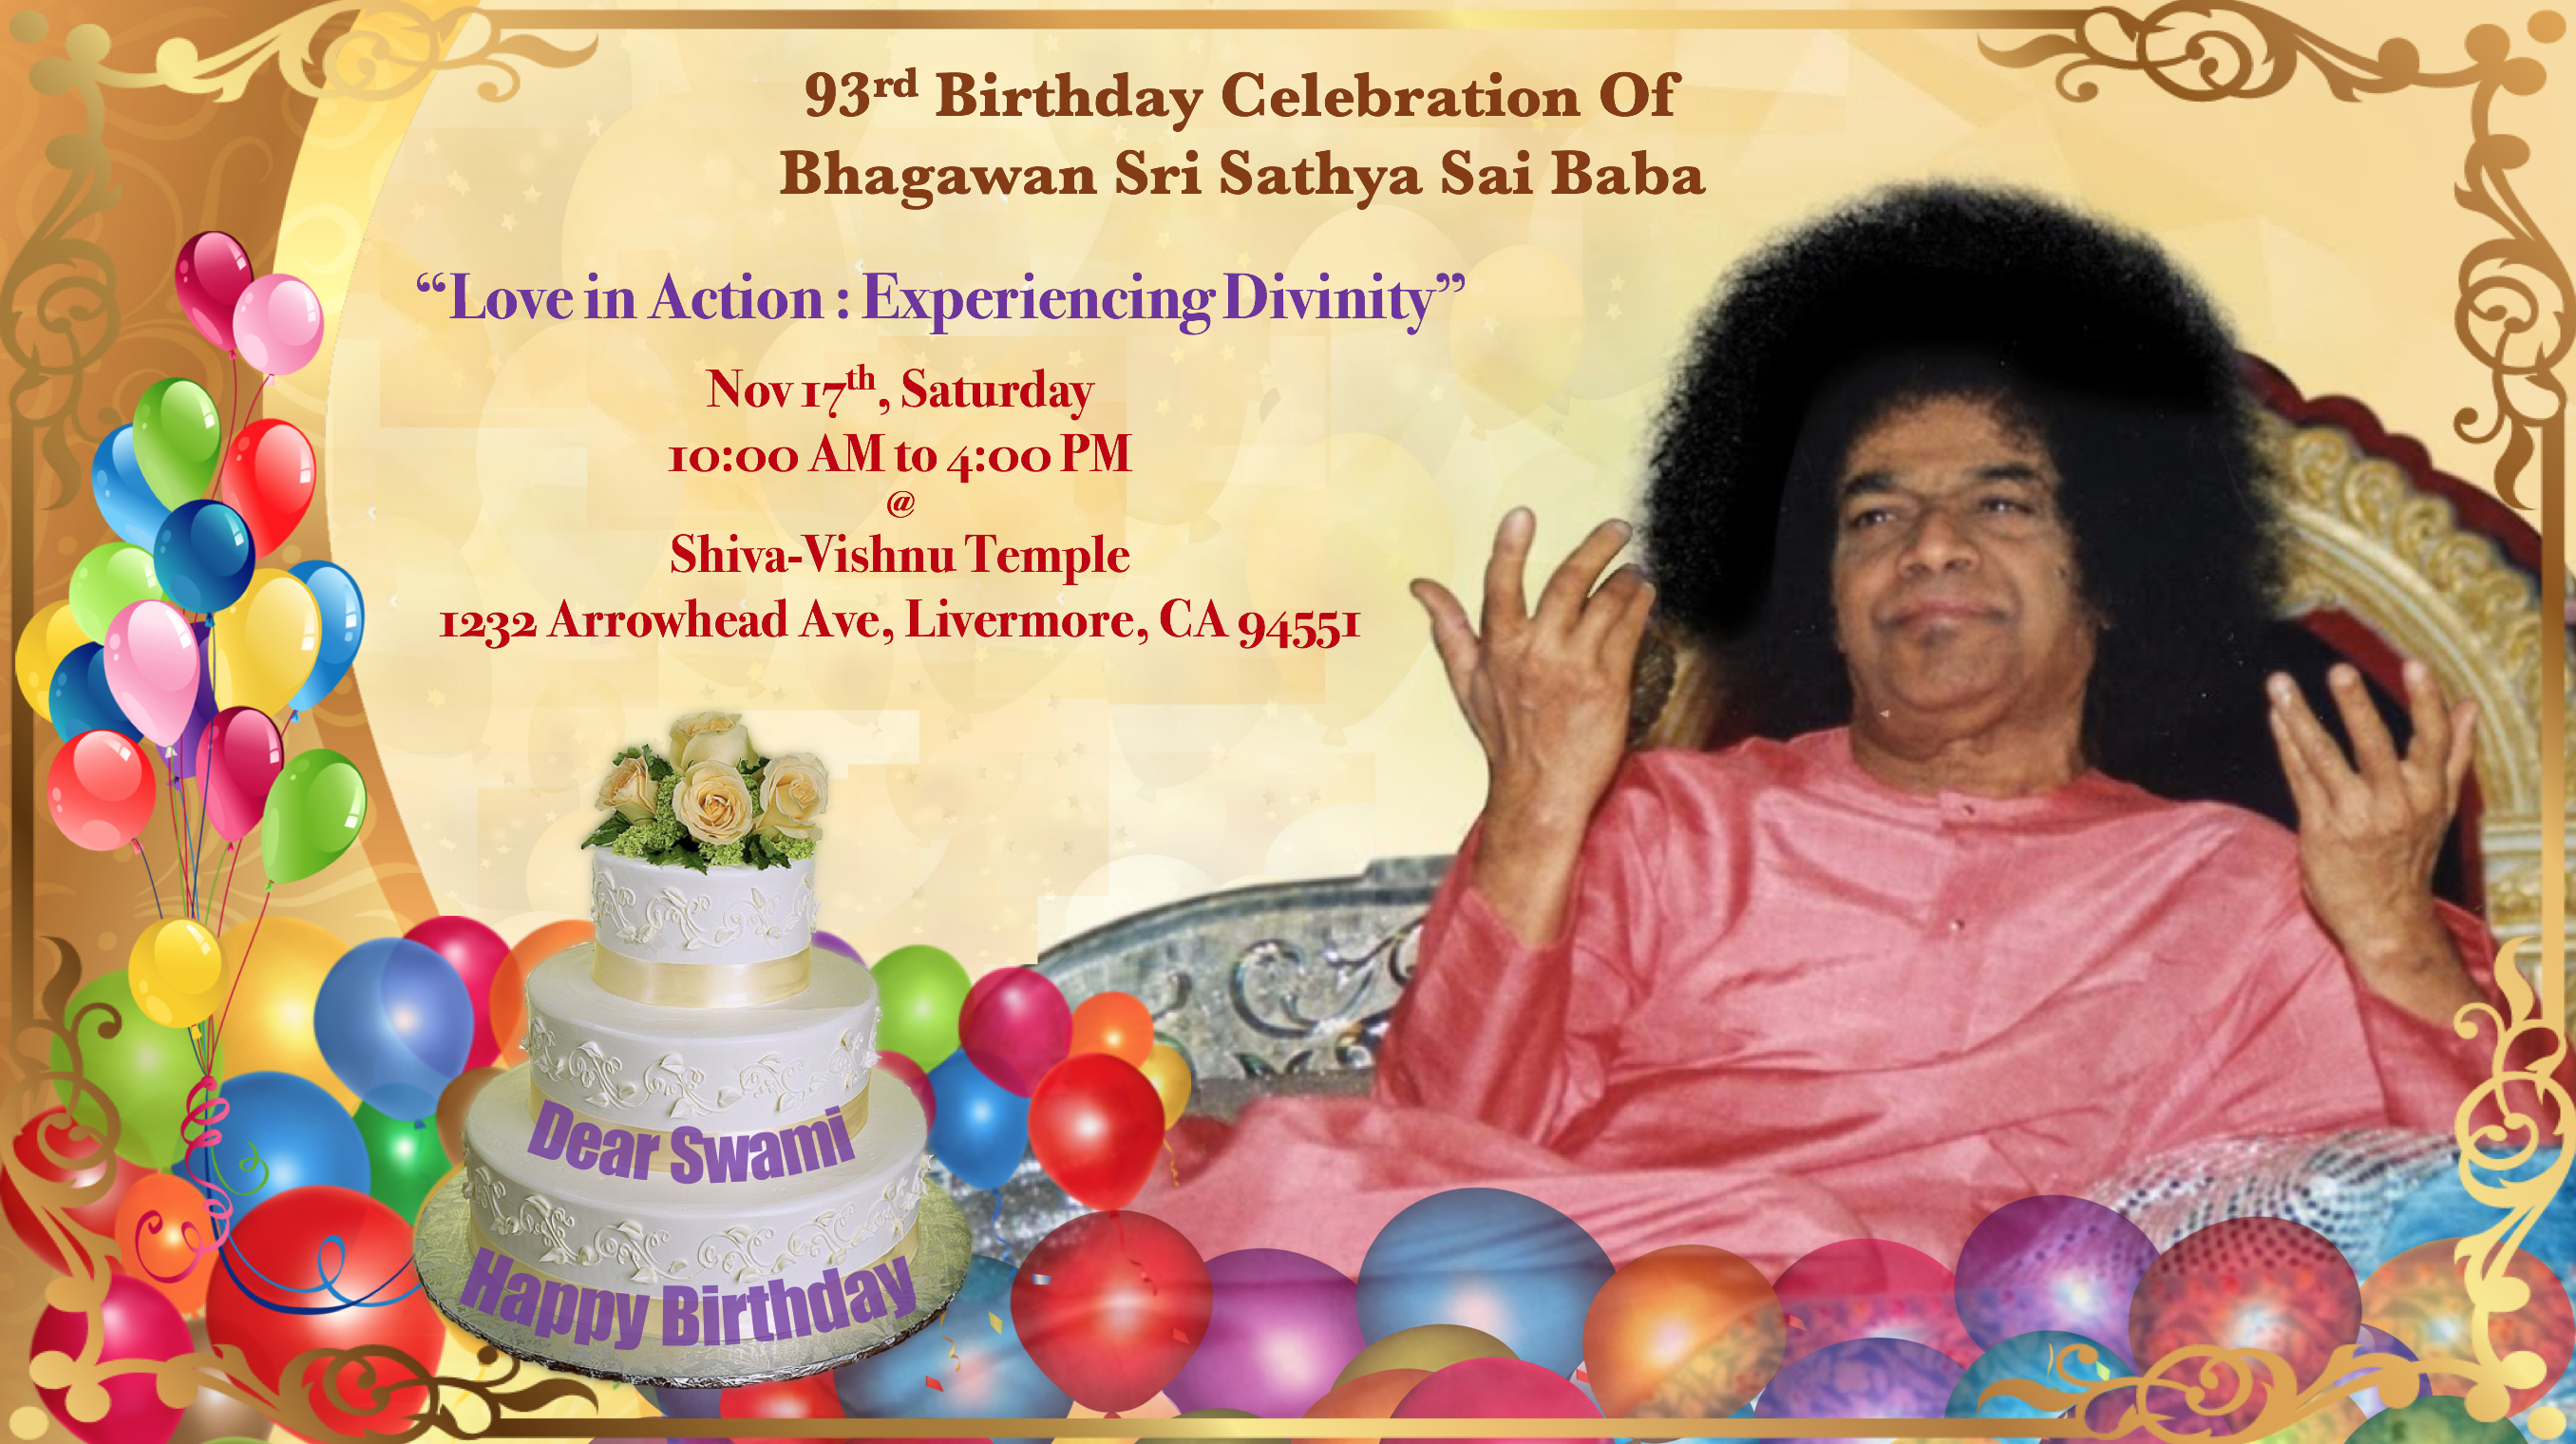 Bhagawan Sri Sathya Sai Baba's 93rd, Birthday Celebrations